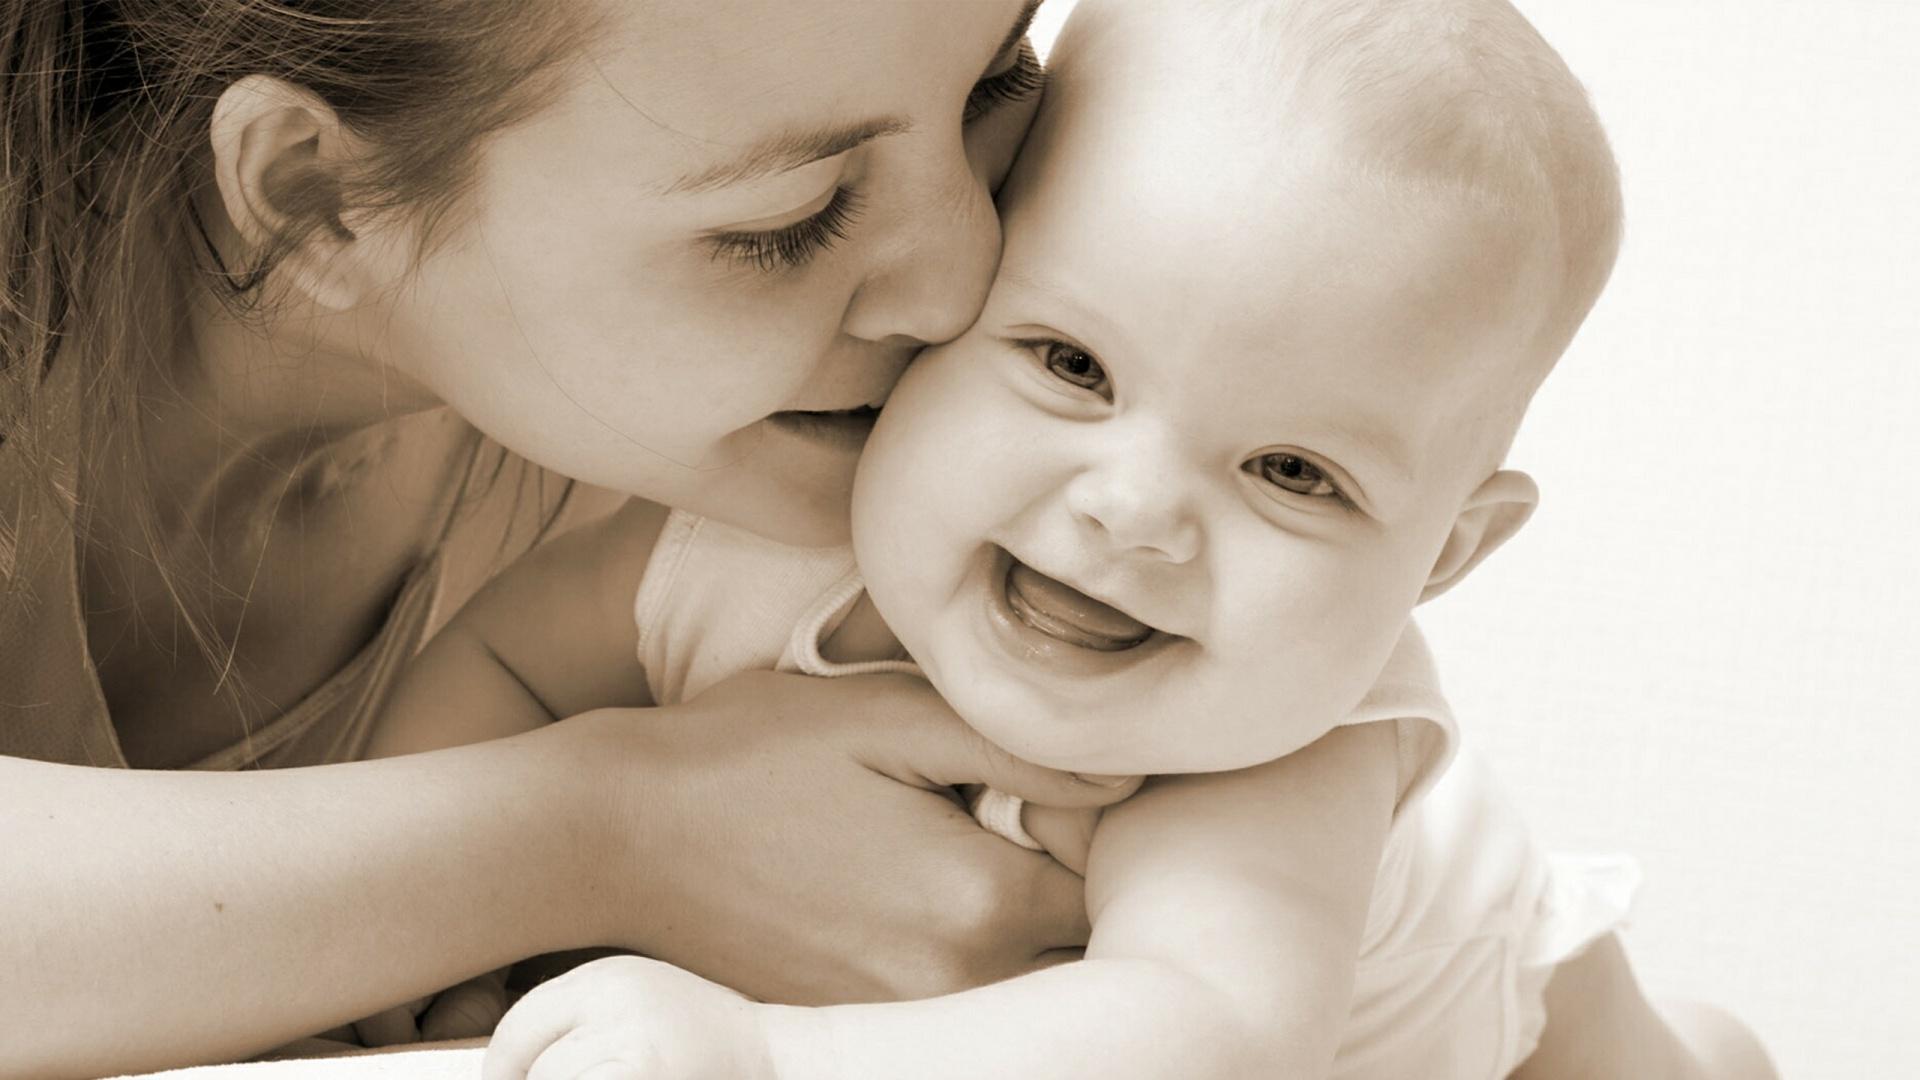 Love Smilling Baby Wallpaper